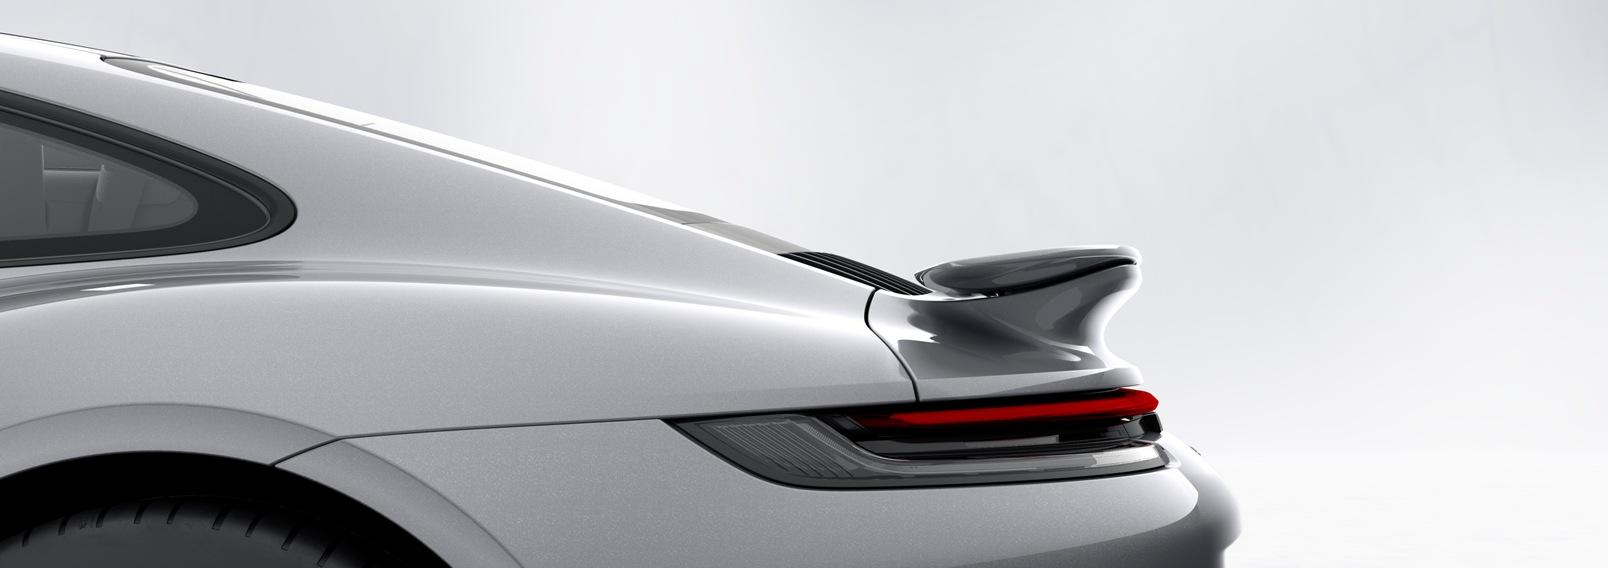 Aerodinámica Porsche 911 Turbo S (7)